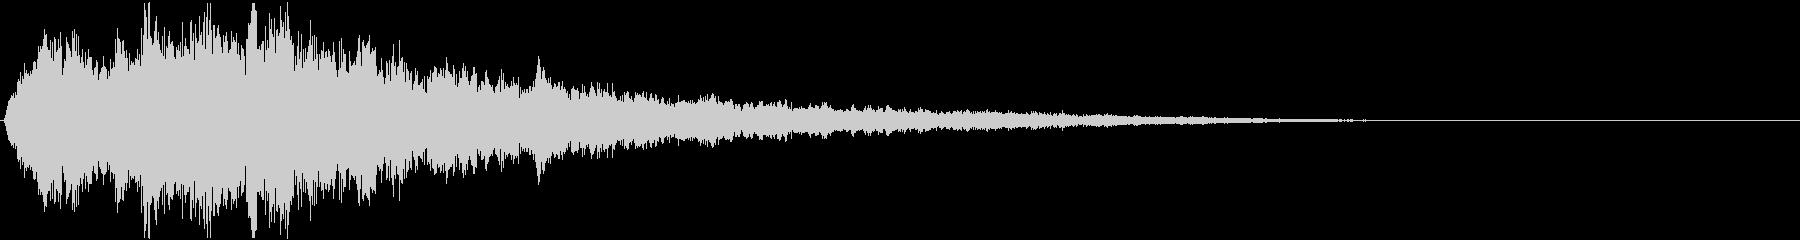 SE 2120年の宇宙船 シュワーンの未再生の波形